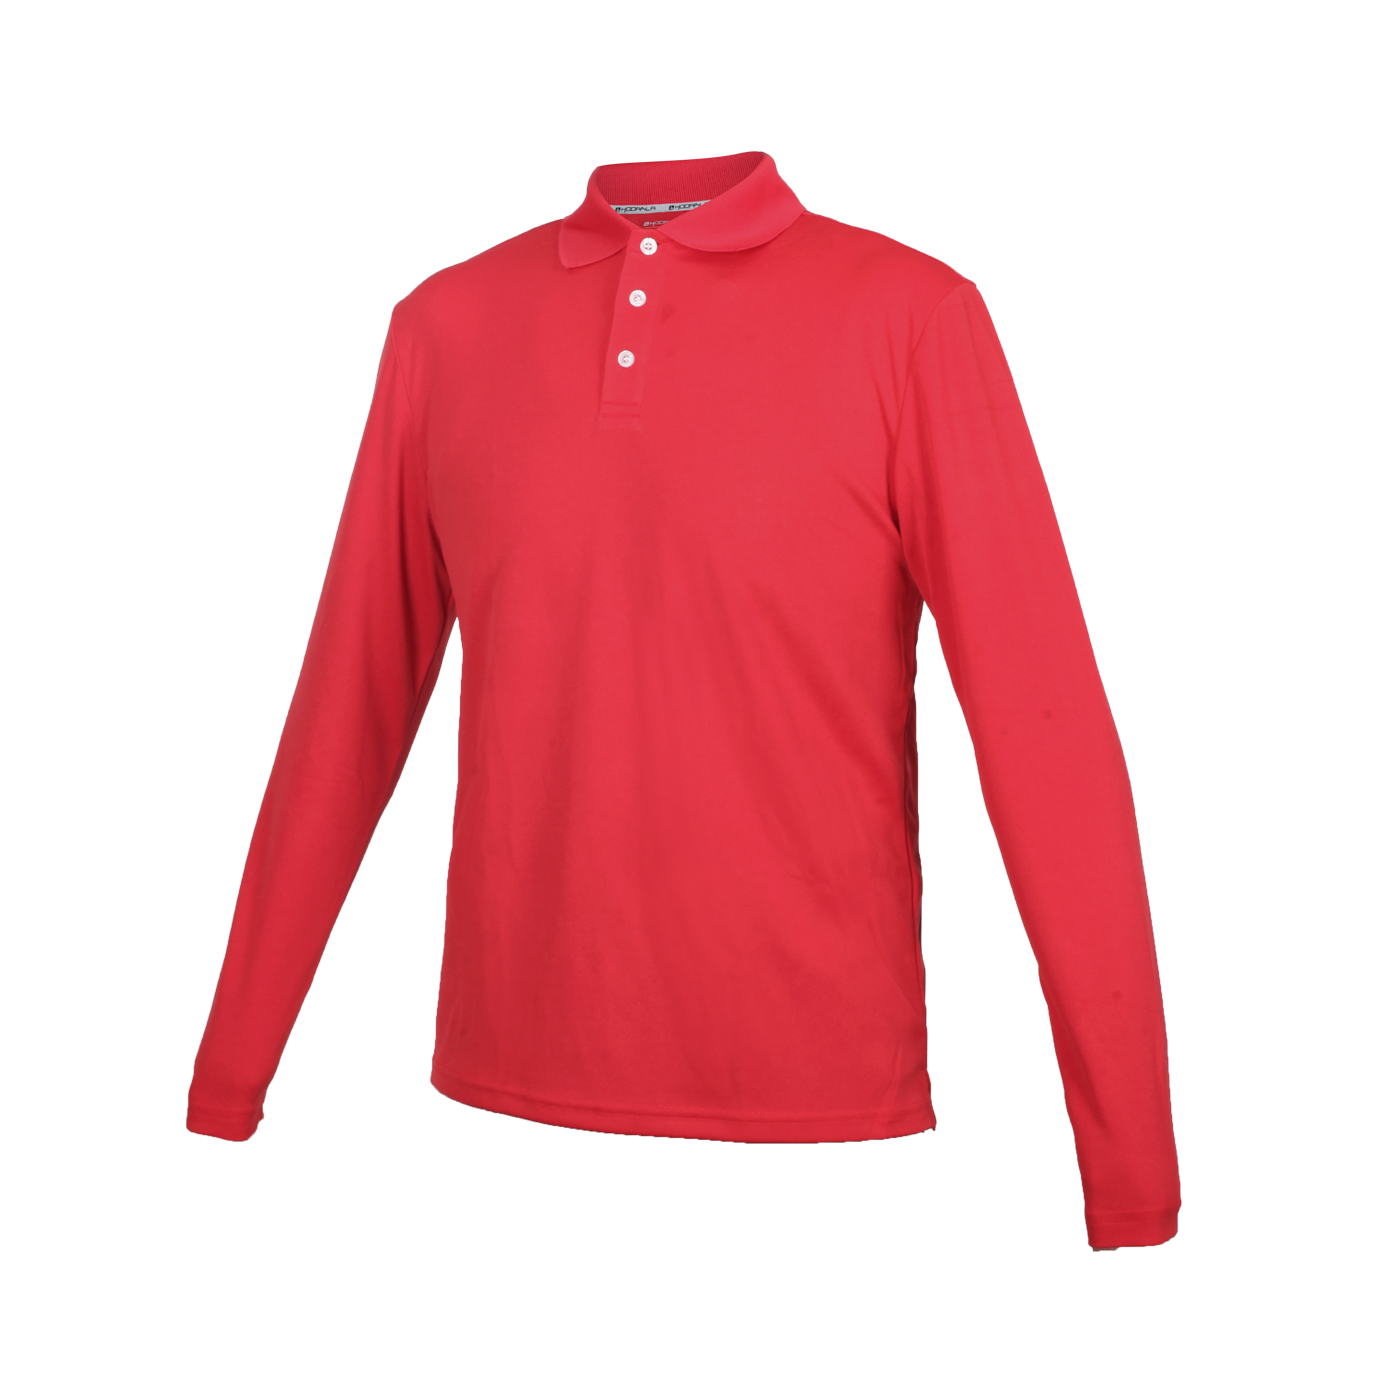 HODARLA 星際吸濕排汗長袖POLO衫 3161301 - 紅